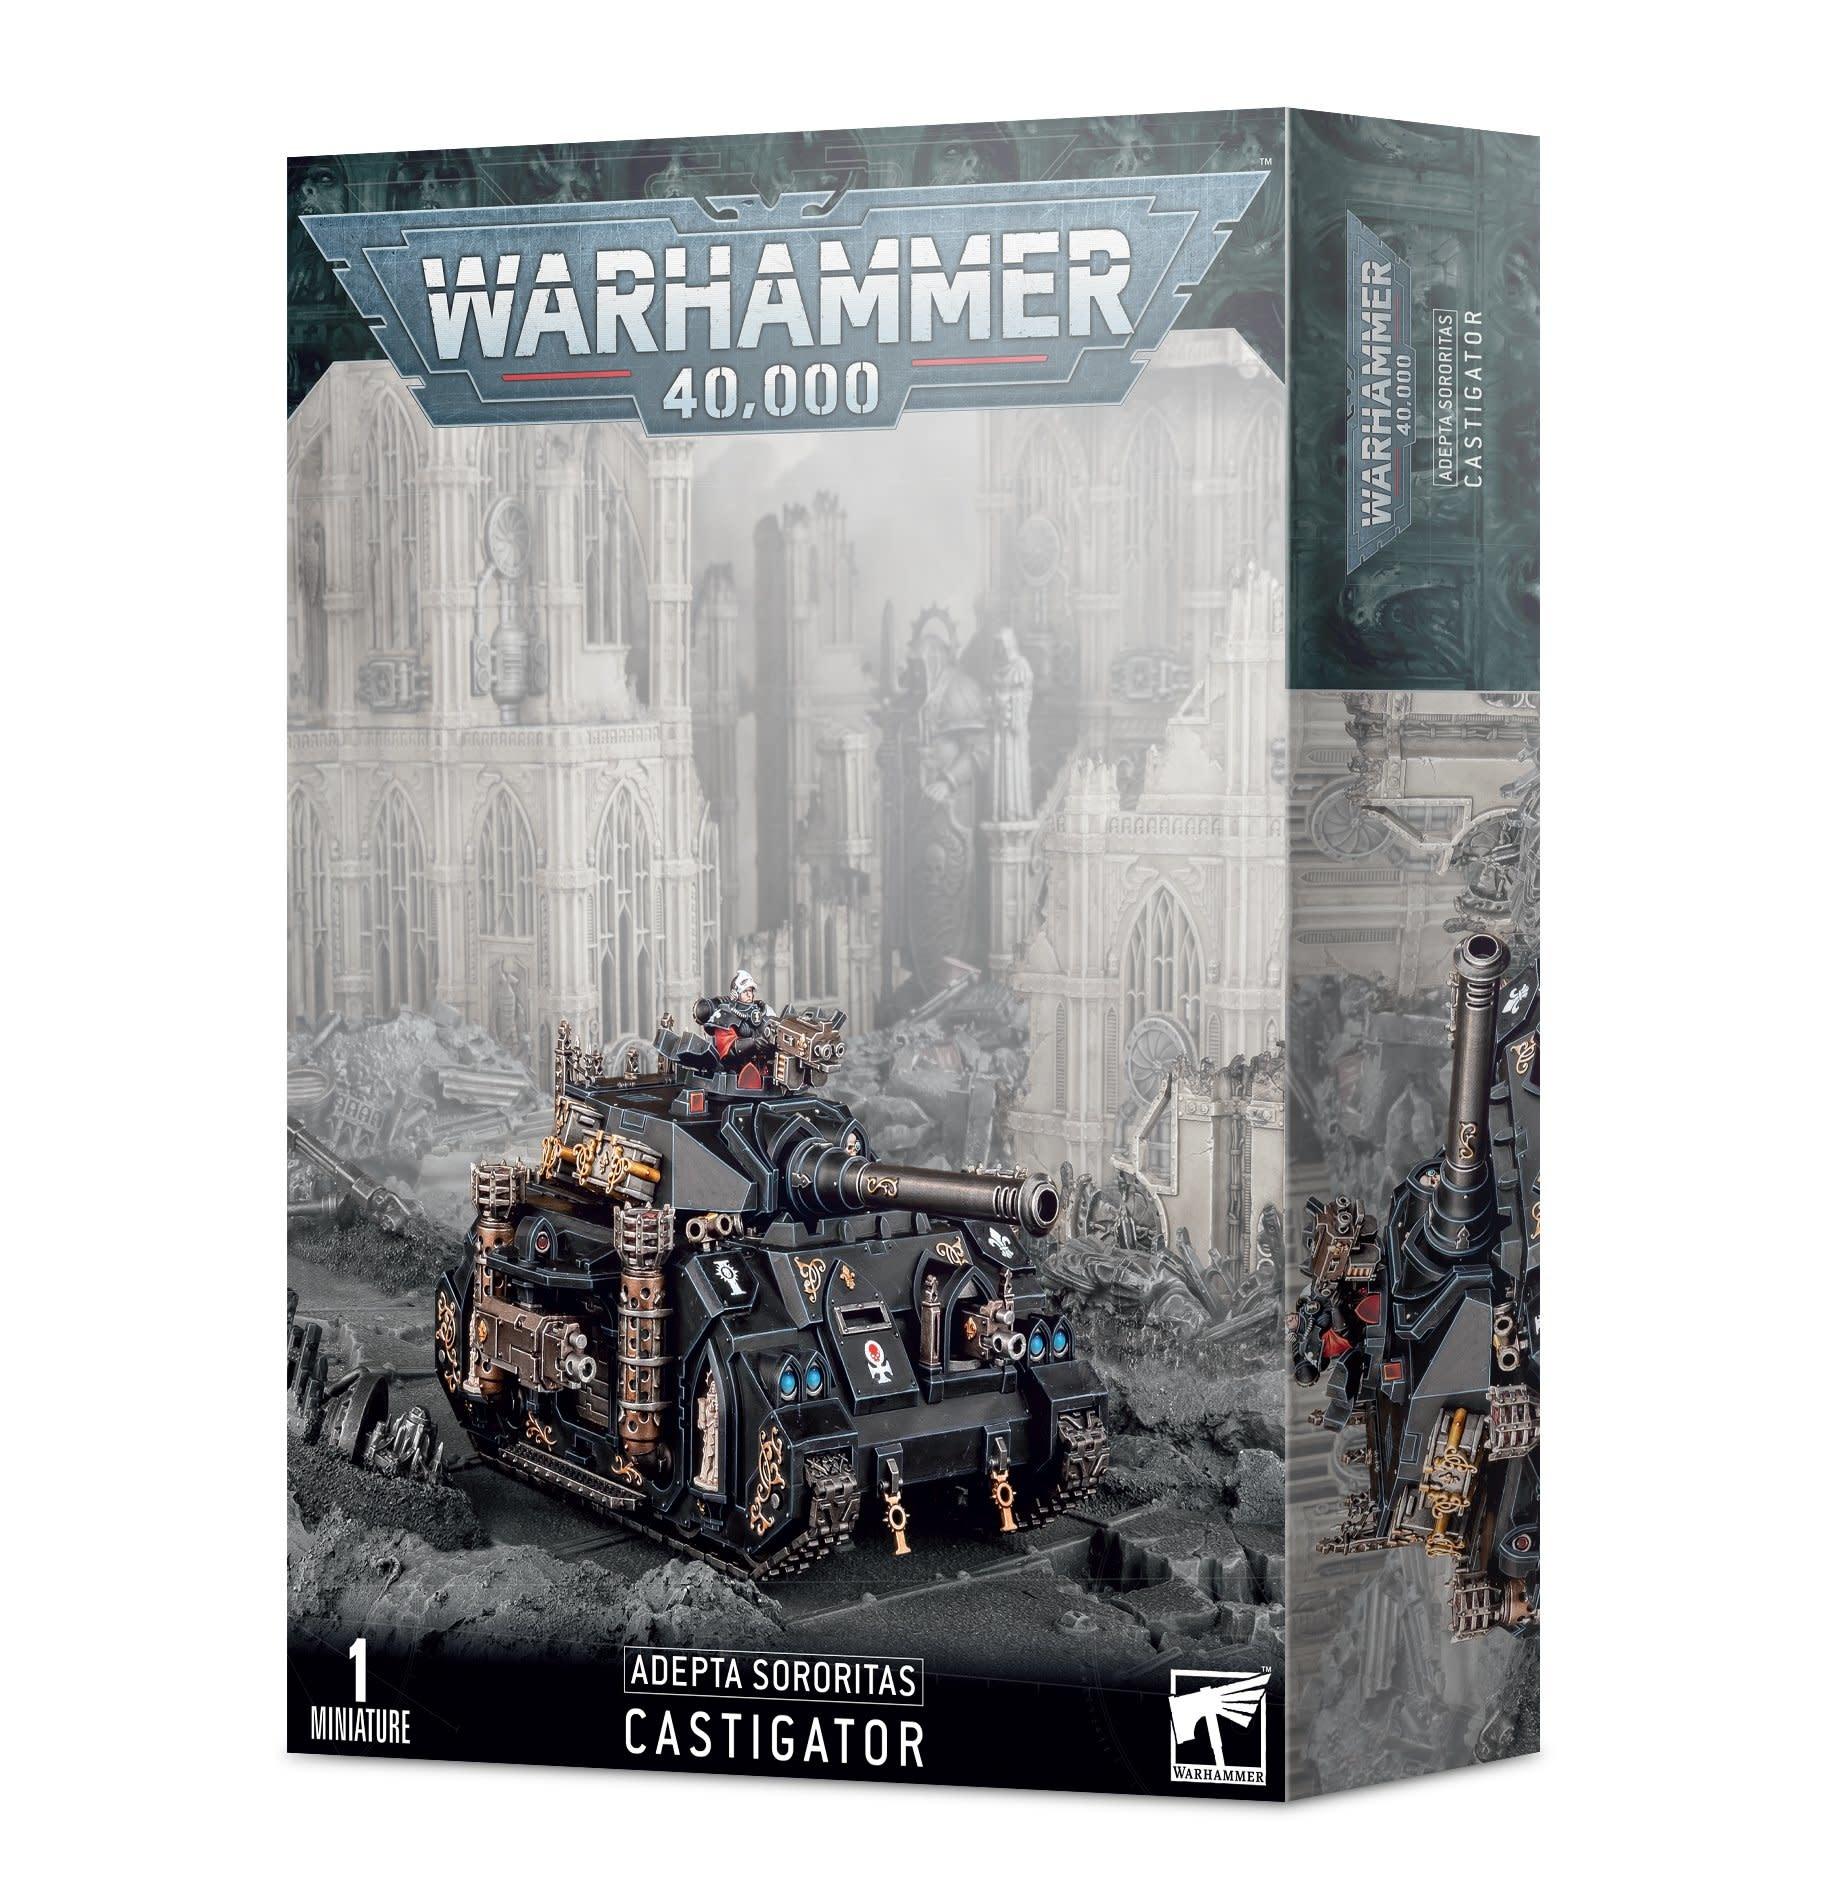 Games Workshop presales 08/07/2021